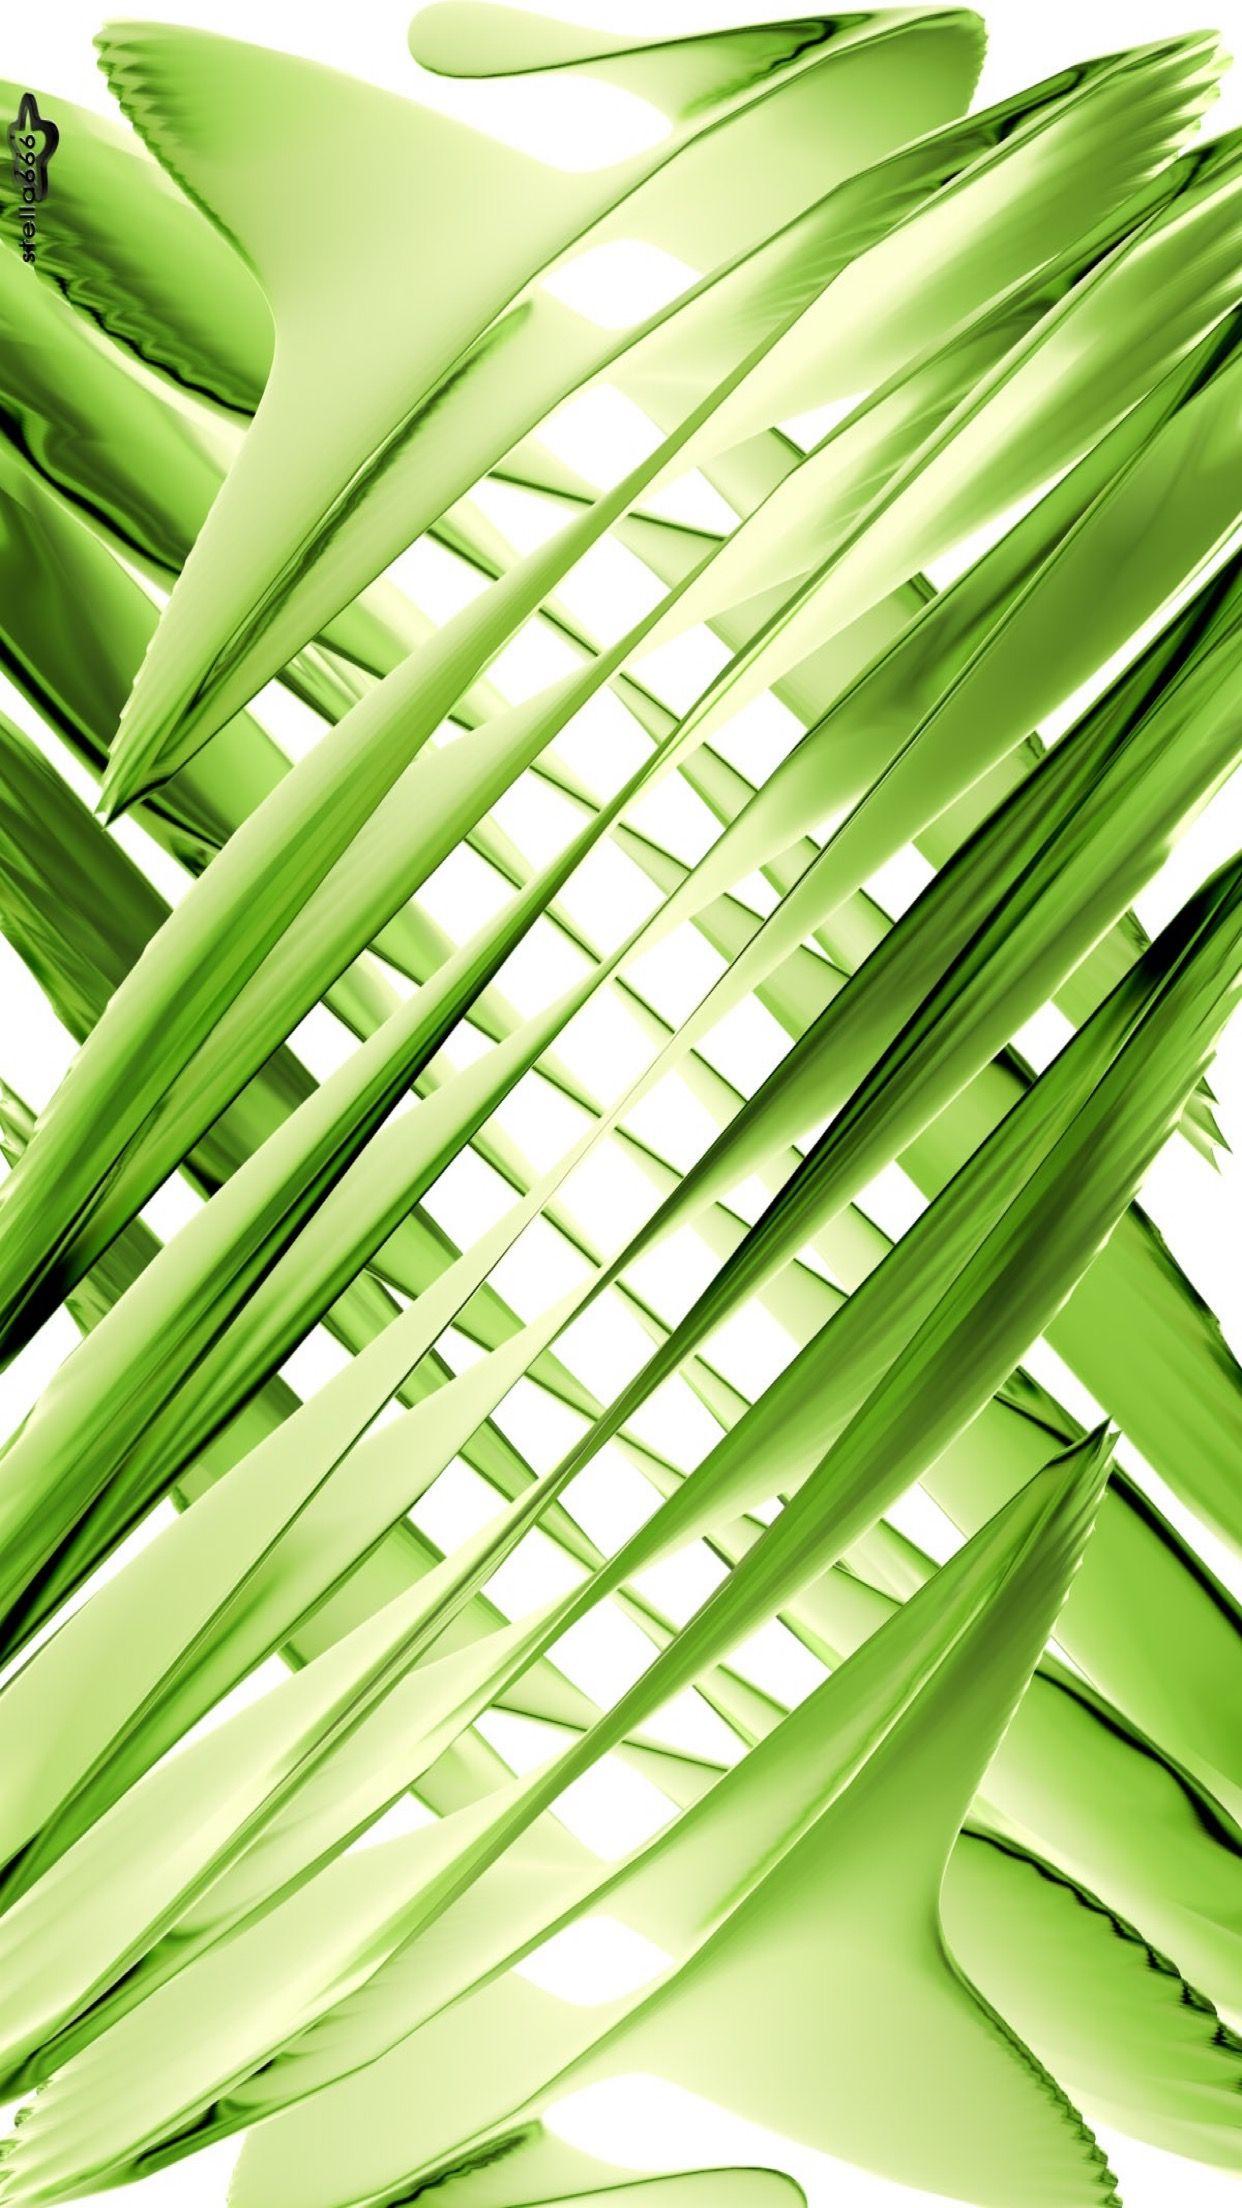 Green, grass, abstract, apple, wallpaper, iPhone, clean